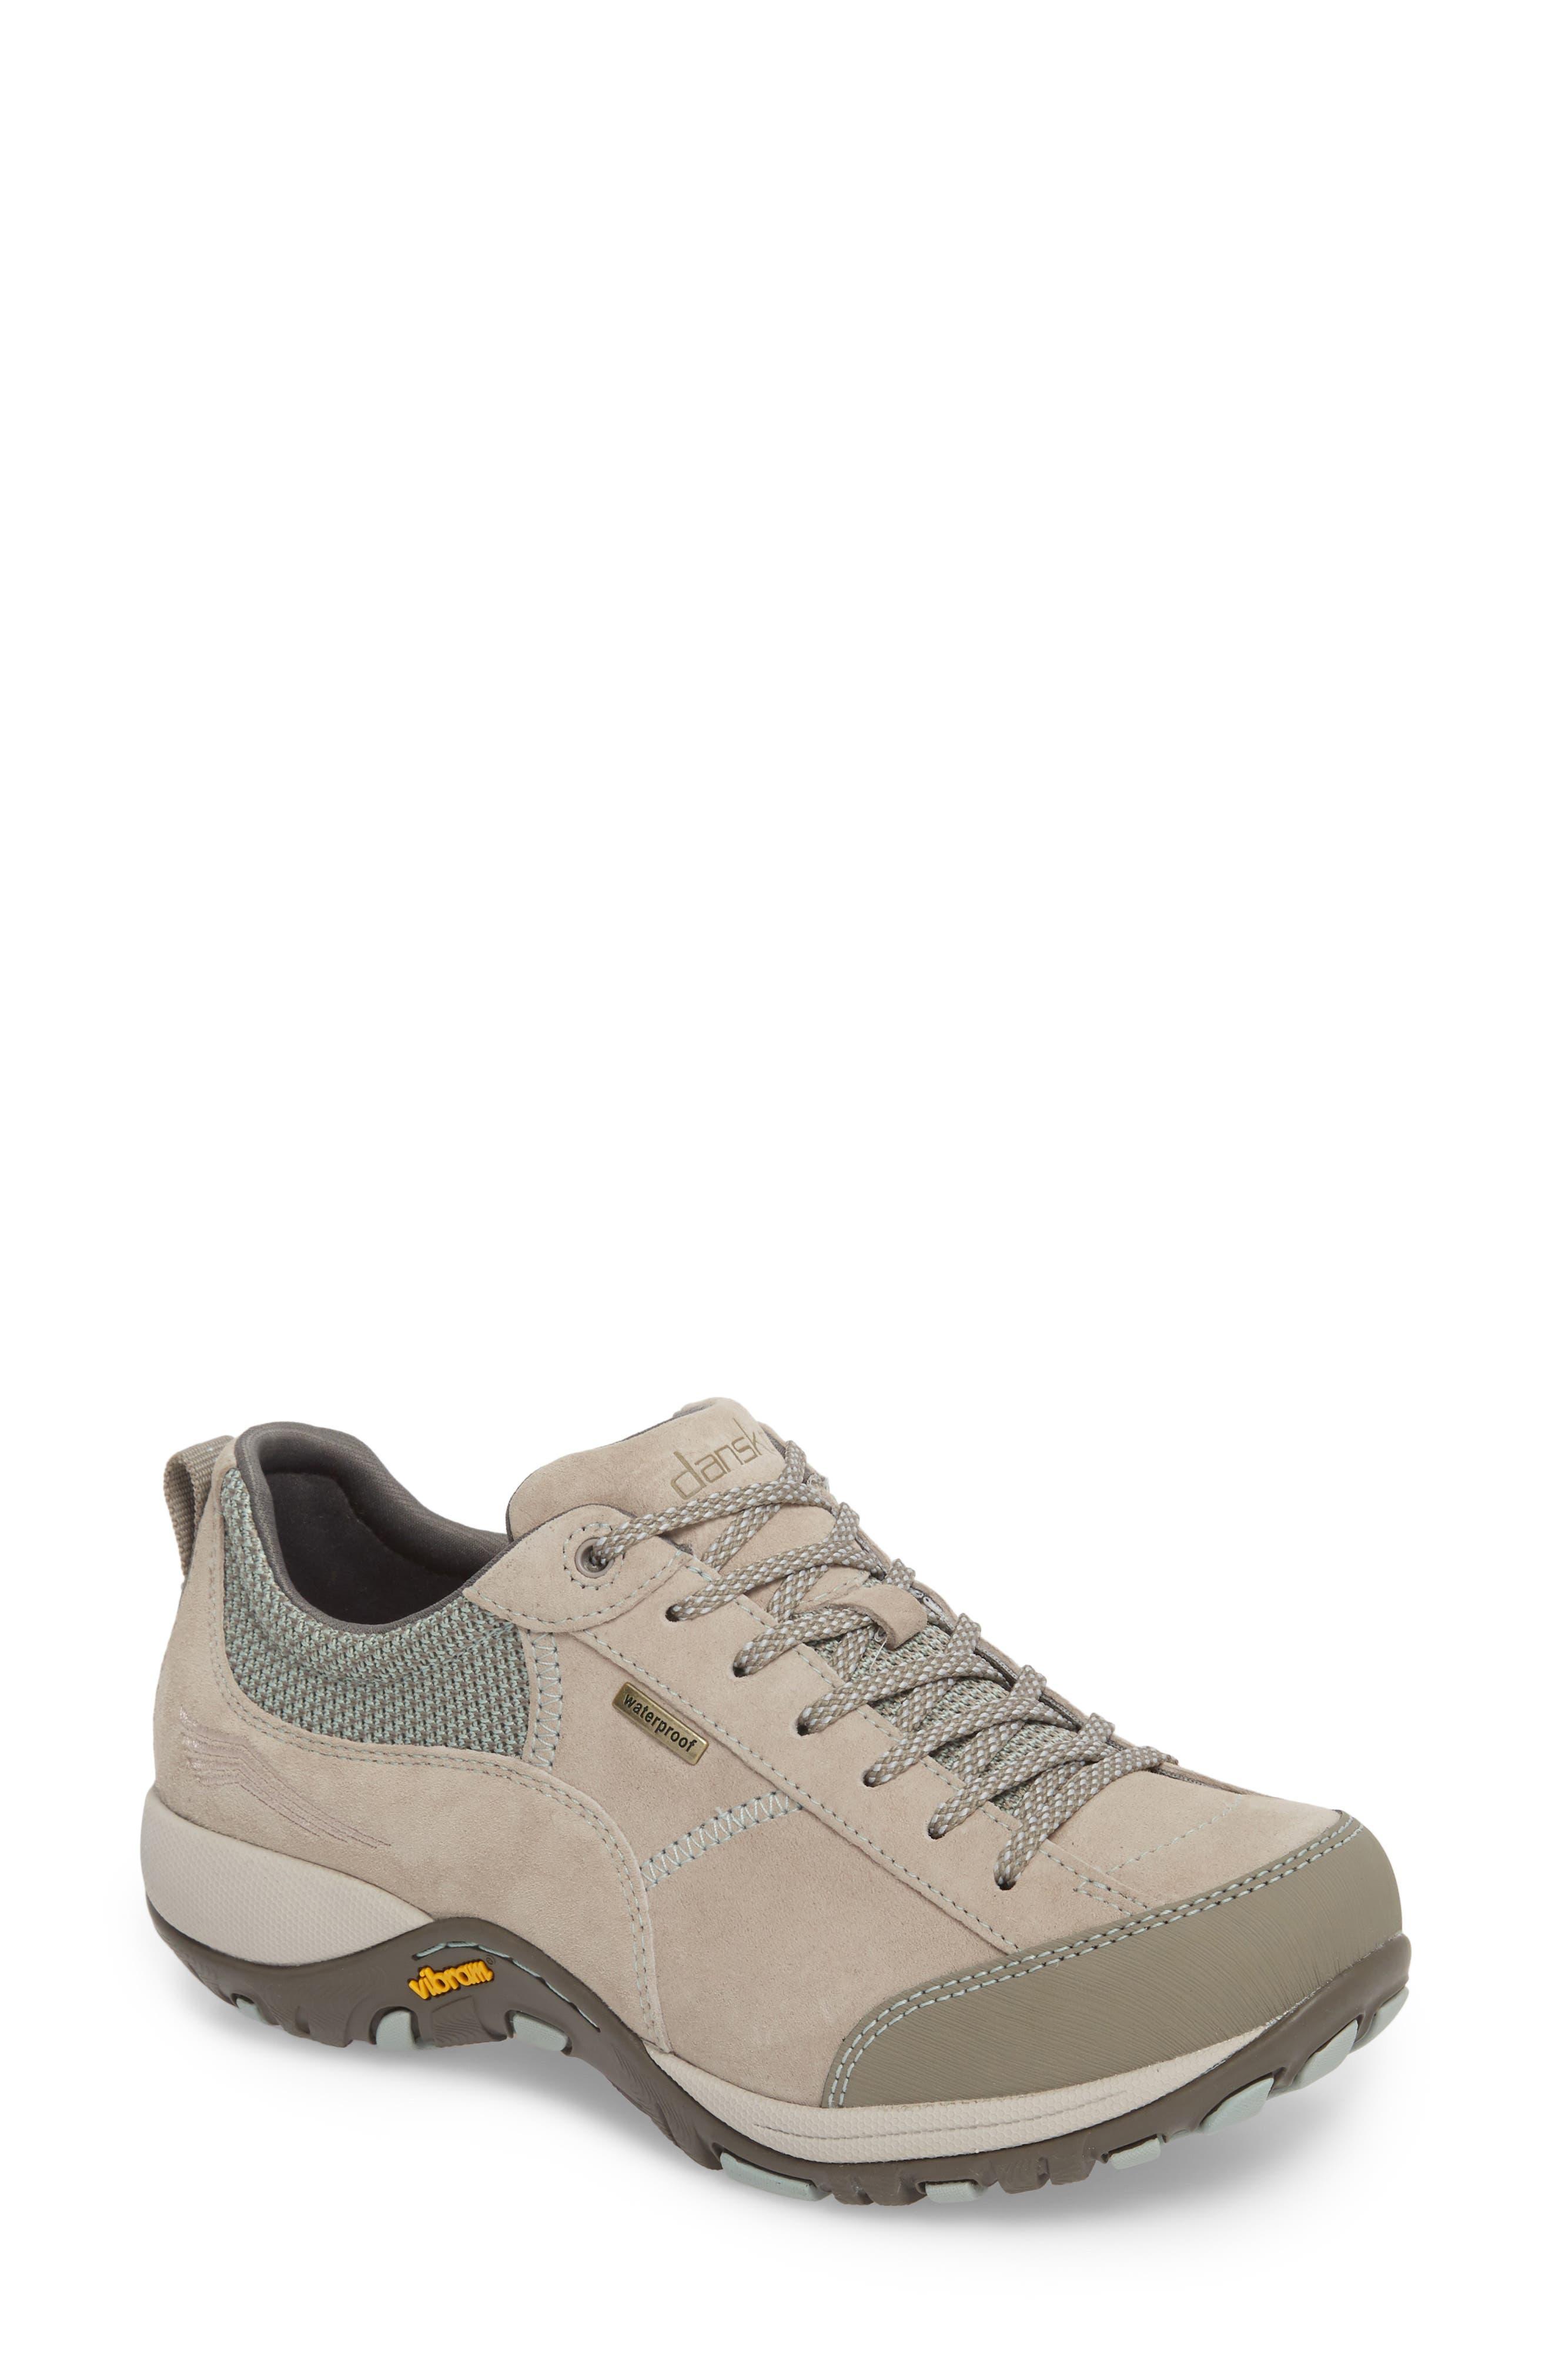 Paisley Waterproof Sneaker,                             Main thumbnail 1, color,                             STONE SUEDE